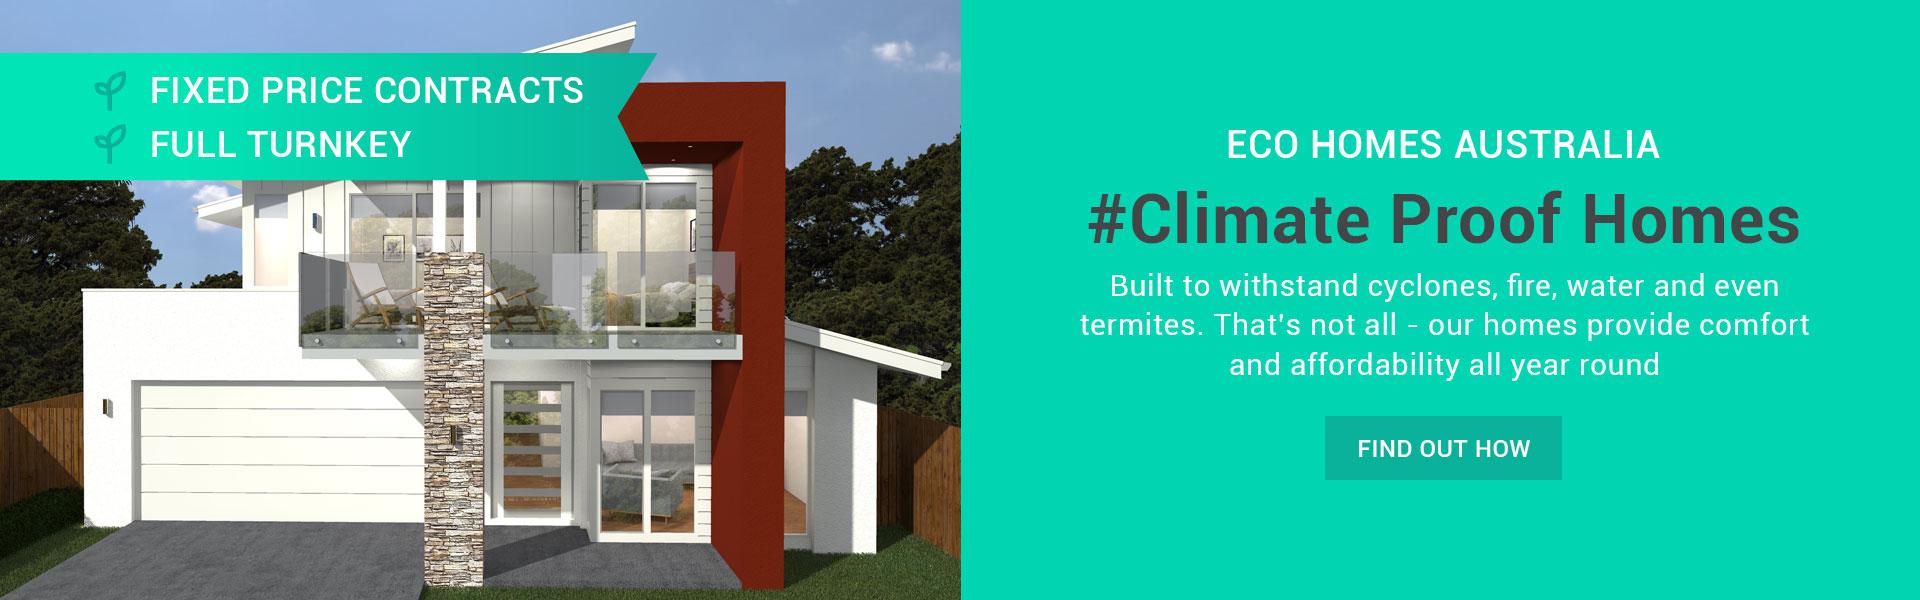 About Eco Homes Australia